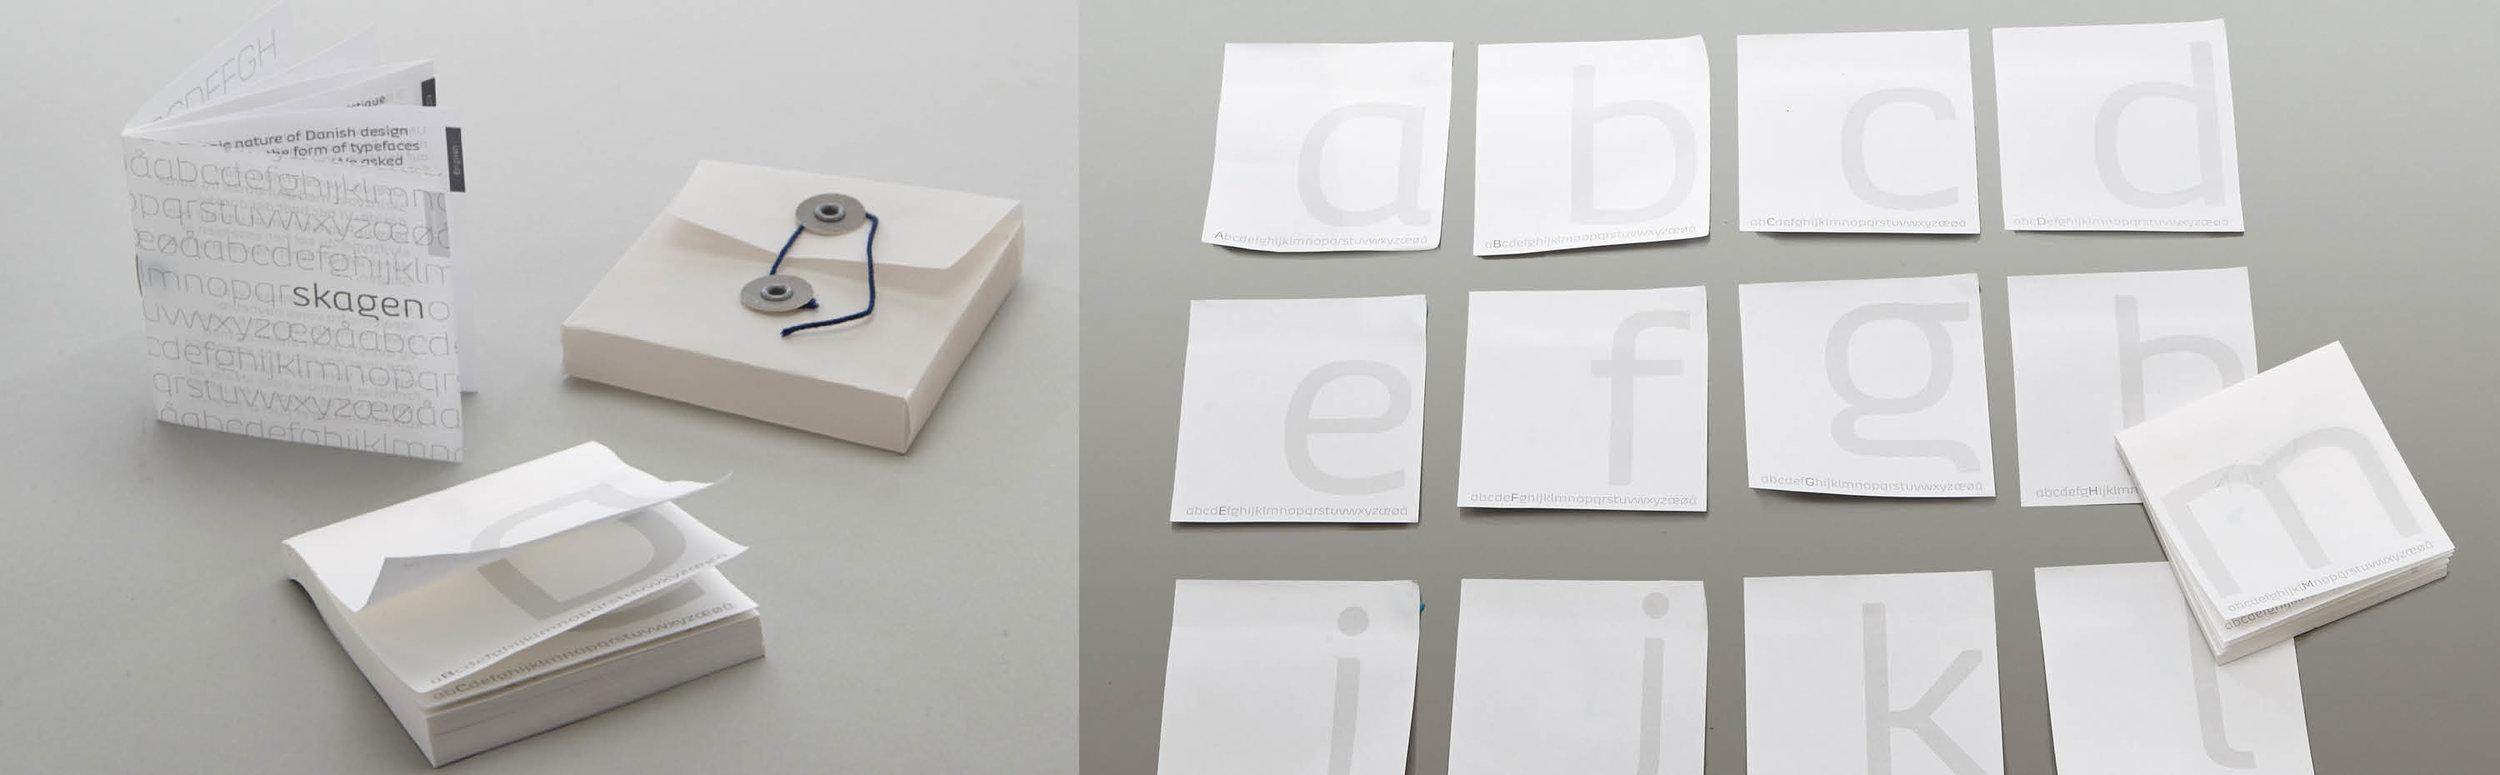 ProductDesign-StationeryGifts-031.jpg